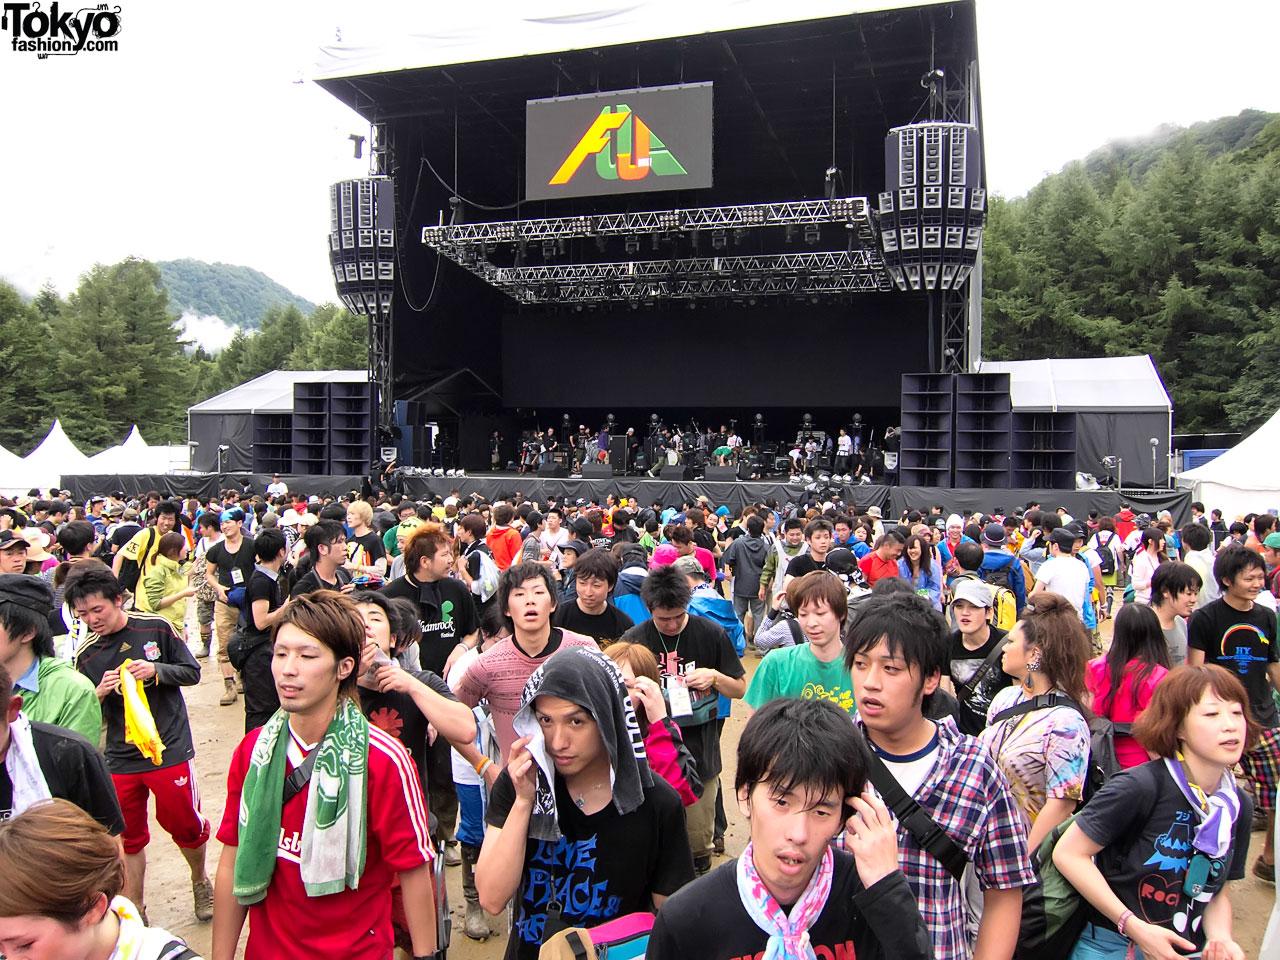 Fuji Rock Festival Tokyo Fashion News